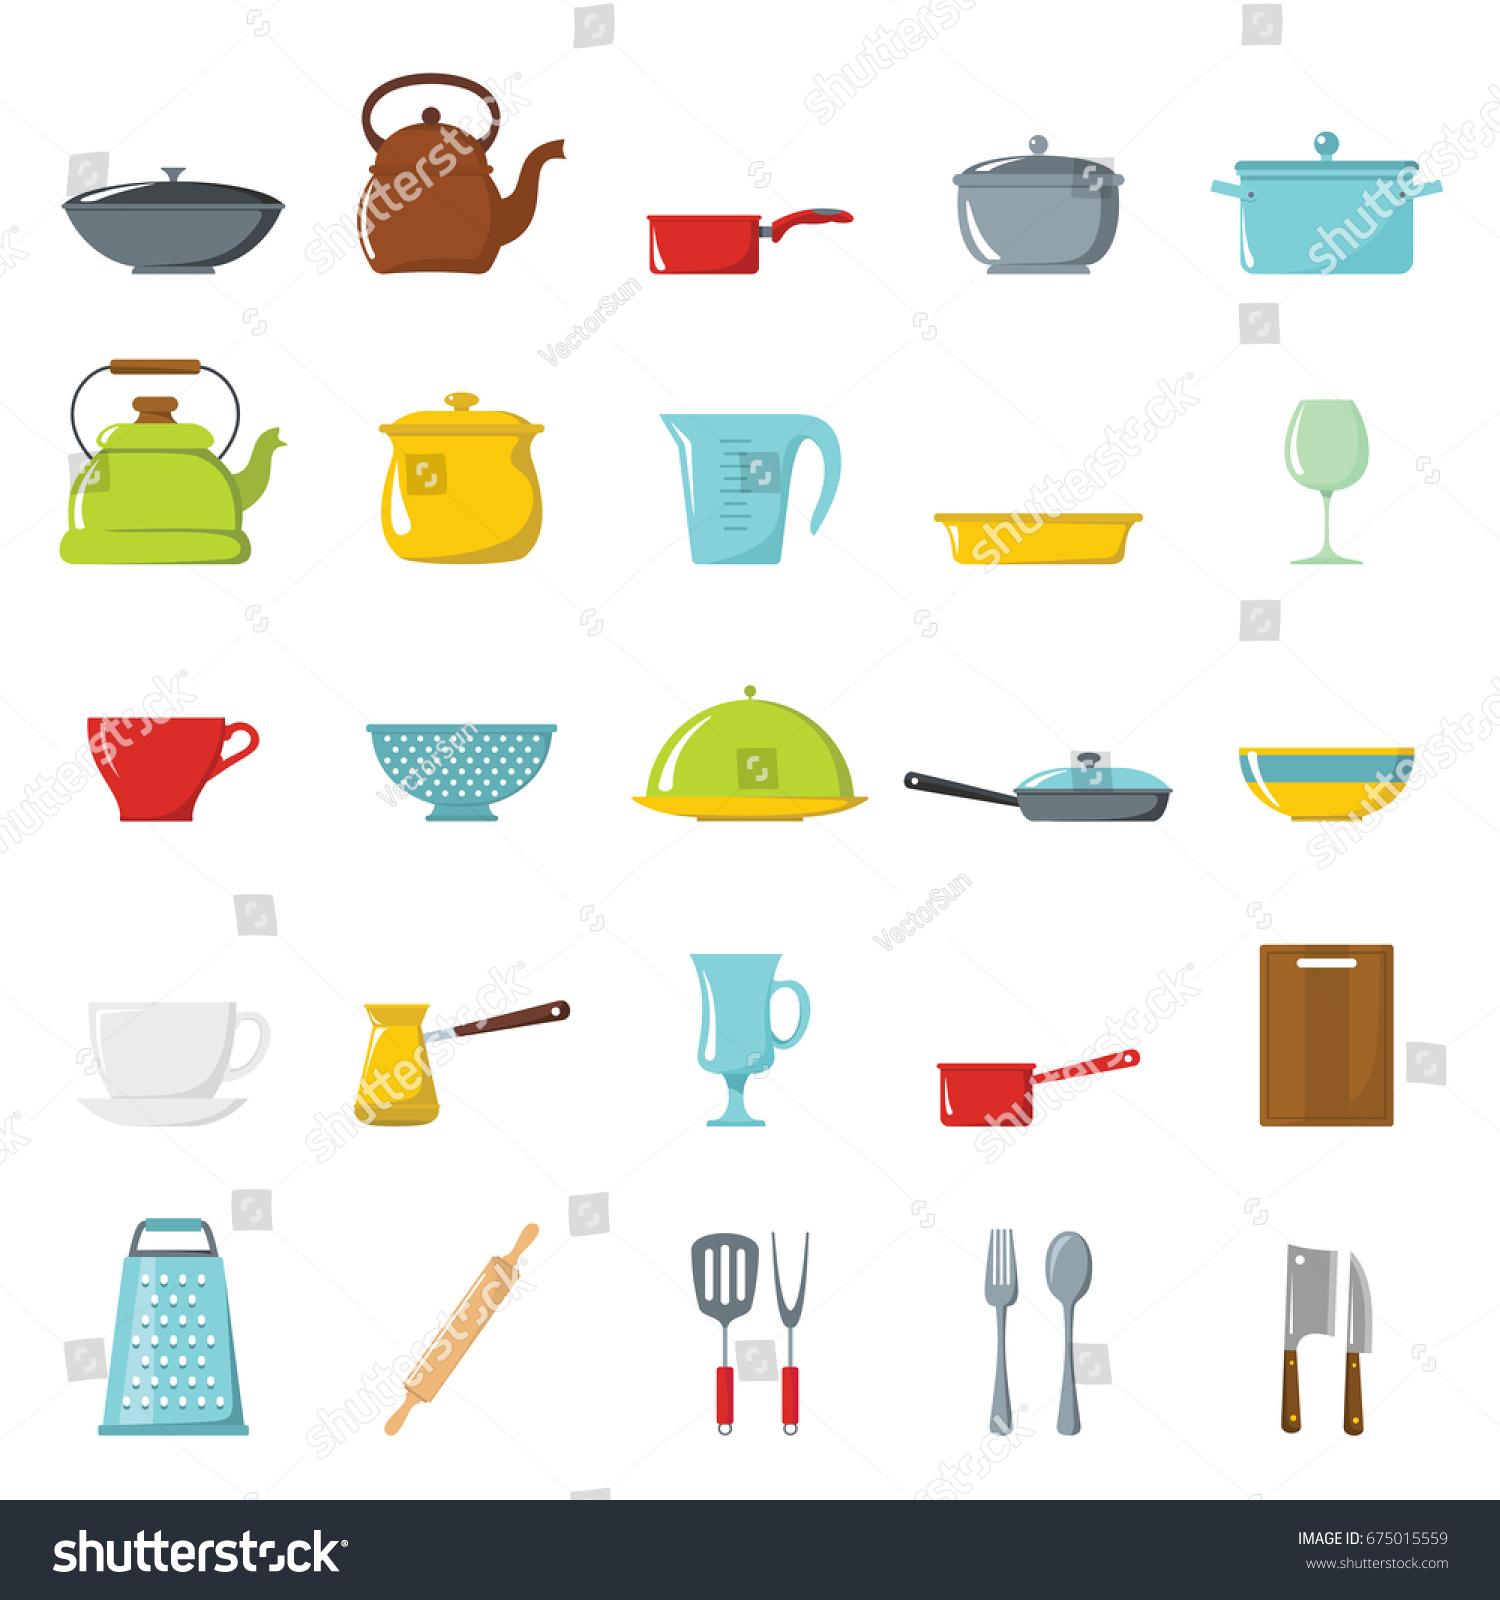 Cartoon Kitchen Tools ~ Kitchen tools dishes cookware kitchenware cartoon stock